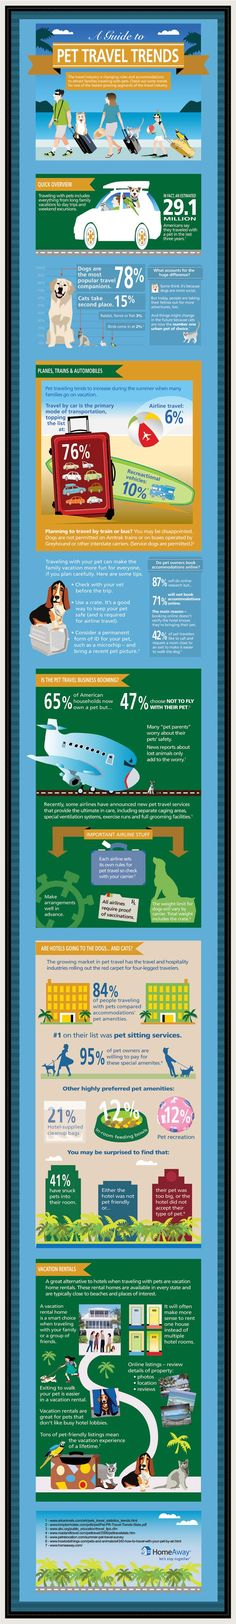 Pet Travel Trends infographic